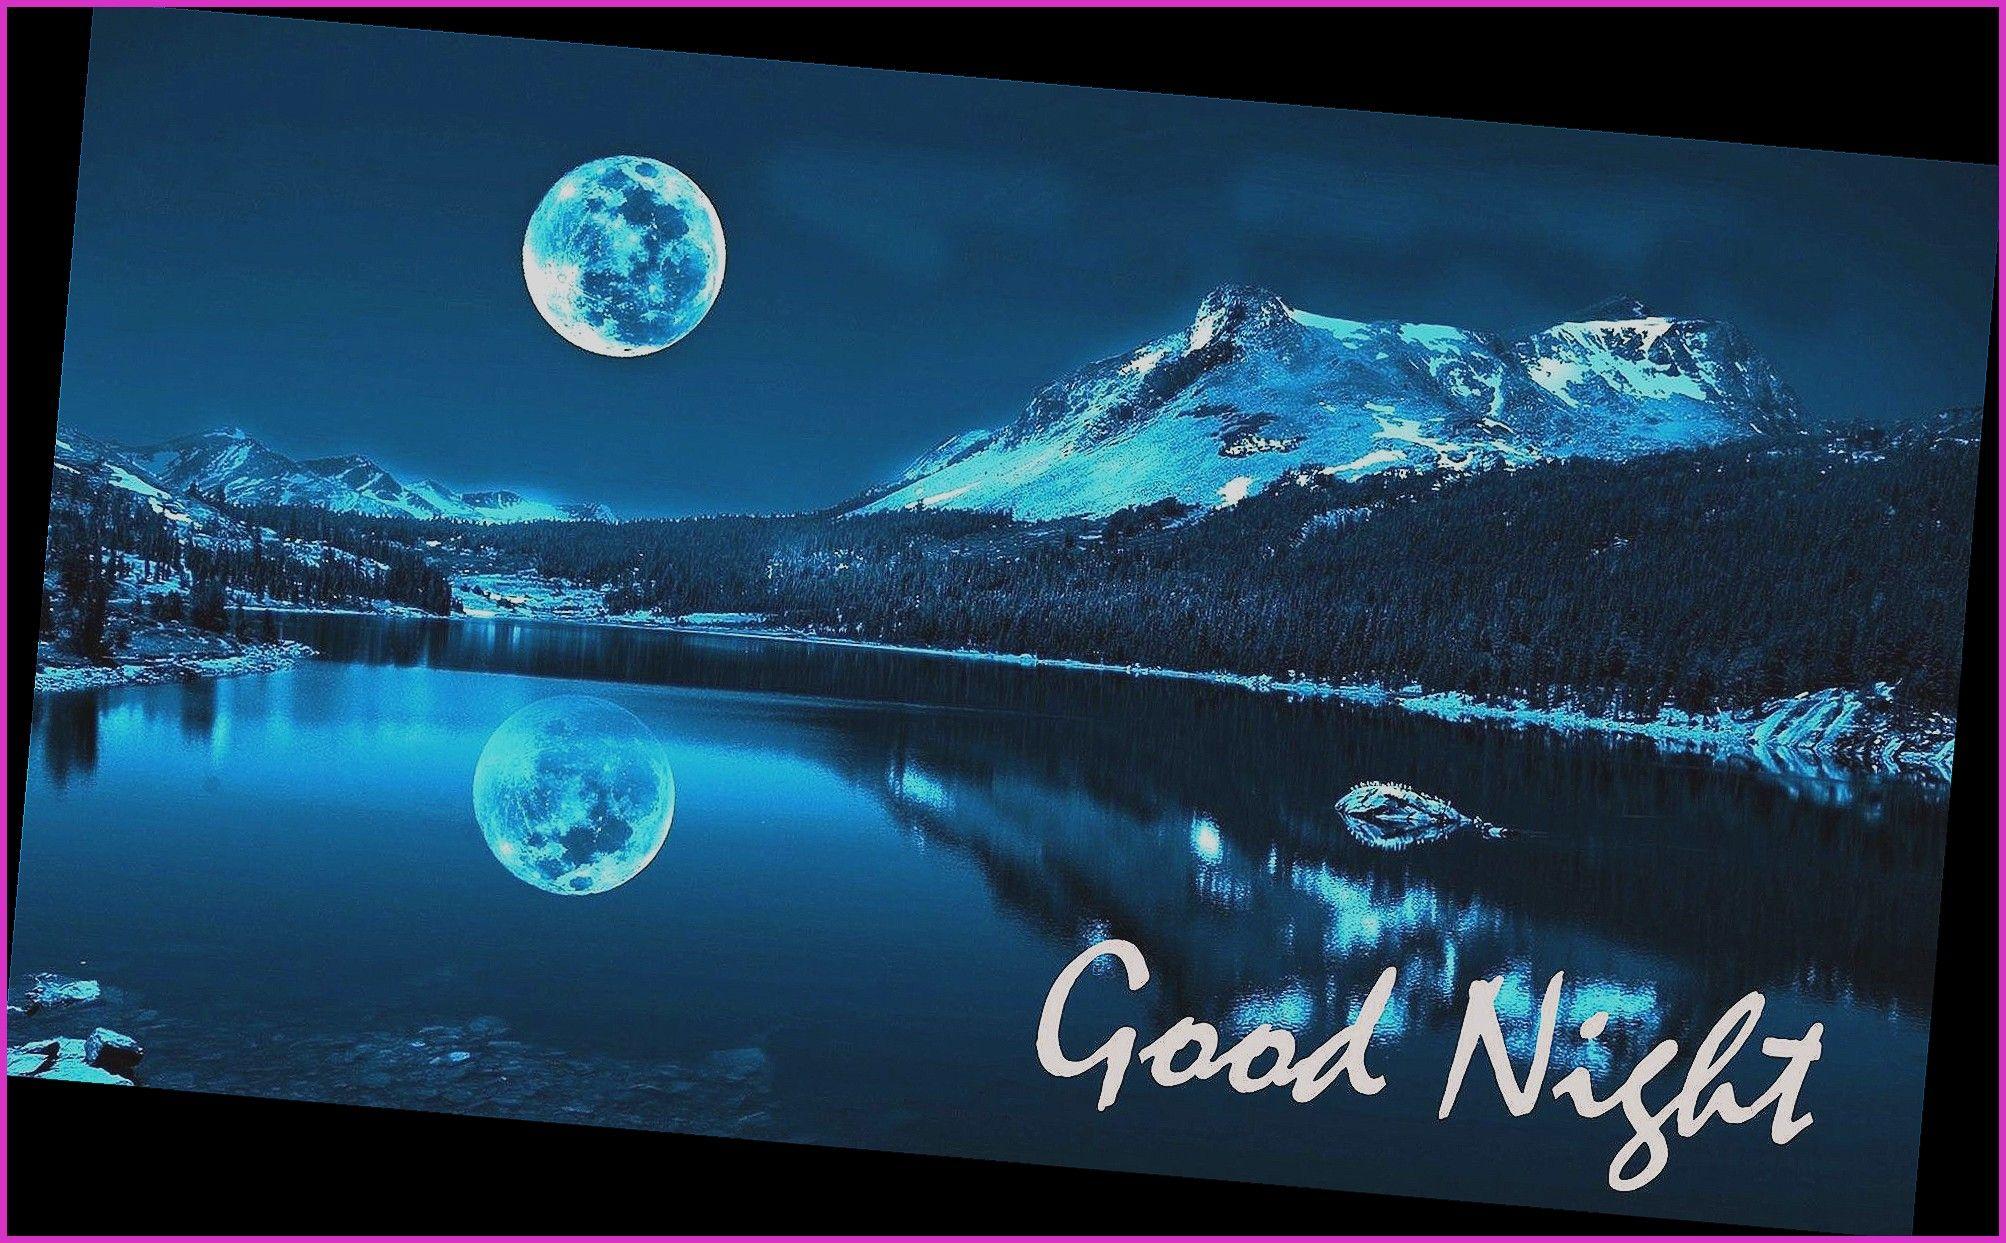 Good Night Wallpaper Hd Group 57 On Isaidyeshub Com Night Scenery Mountain Wallpaper Nature Wallpaper